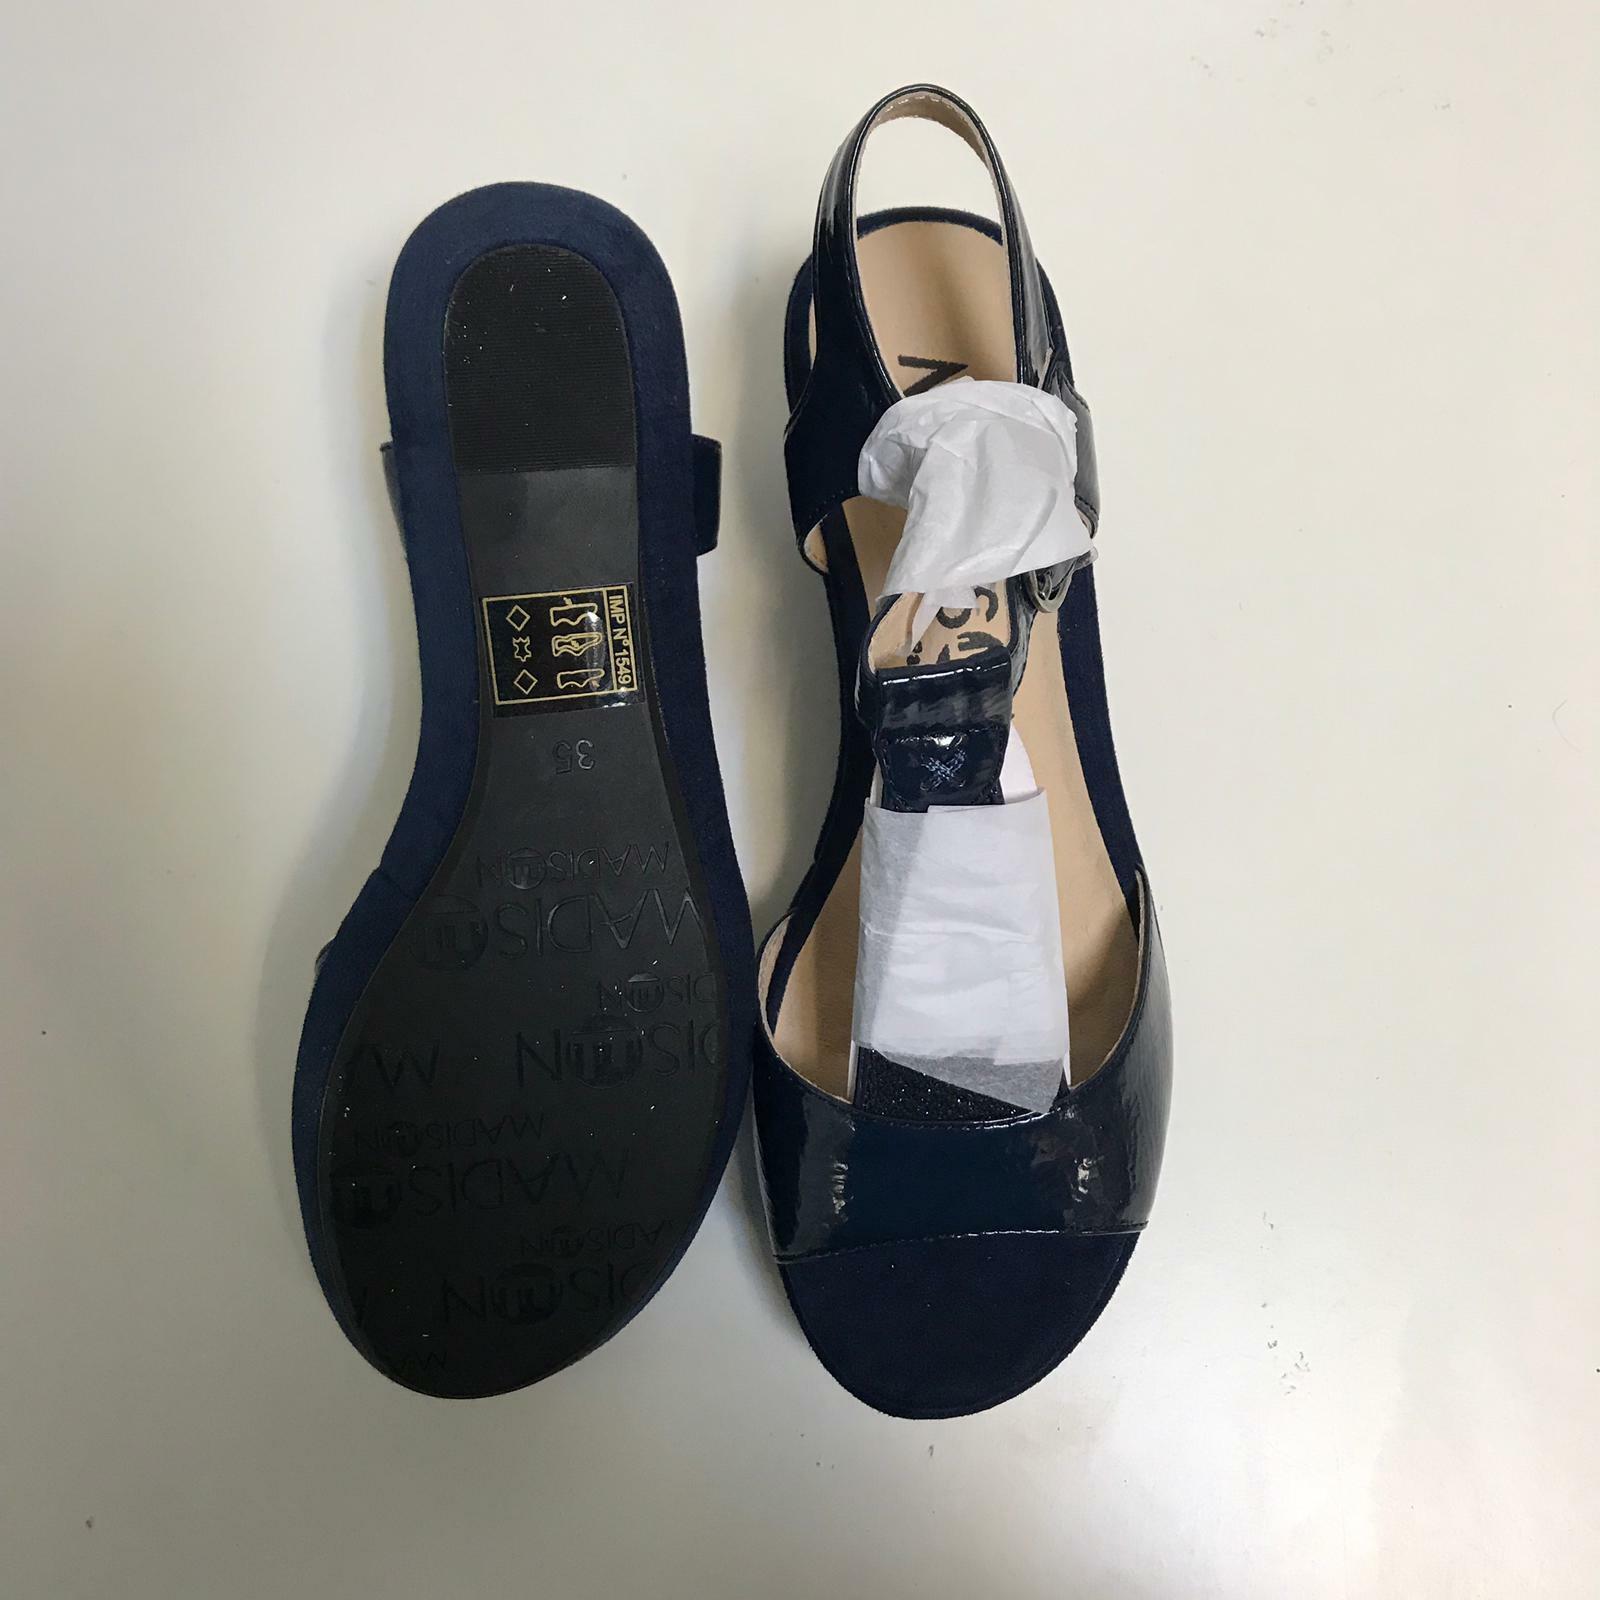 Madison Esolo Damen Schuhe Absatz Frauen Pumps Absatz Schuhe 6,5 cm Blau Gr. 35 a52df5